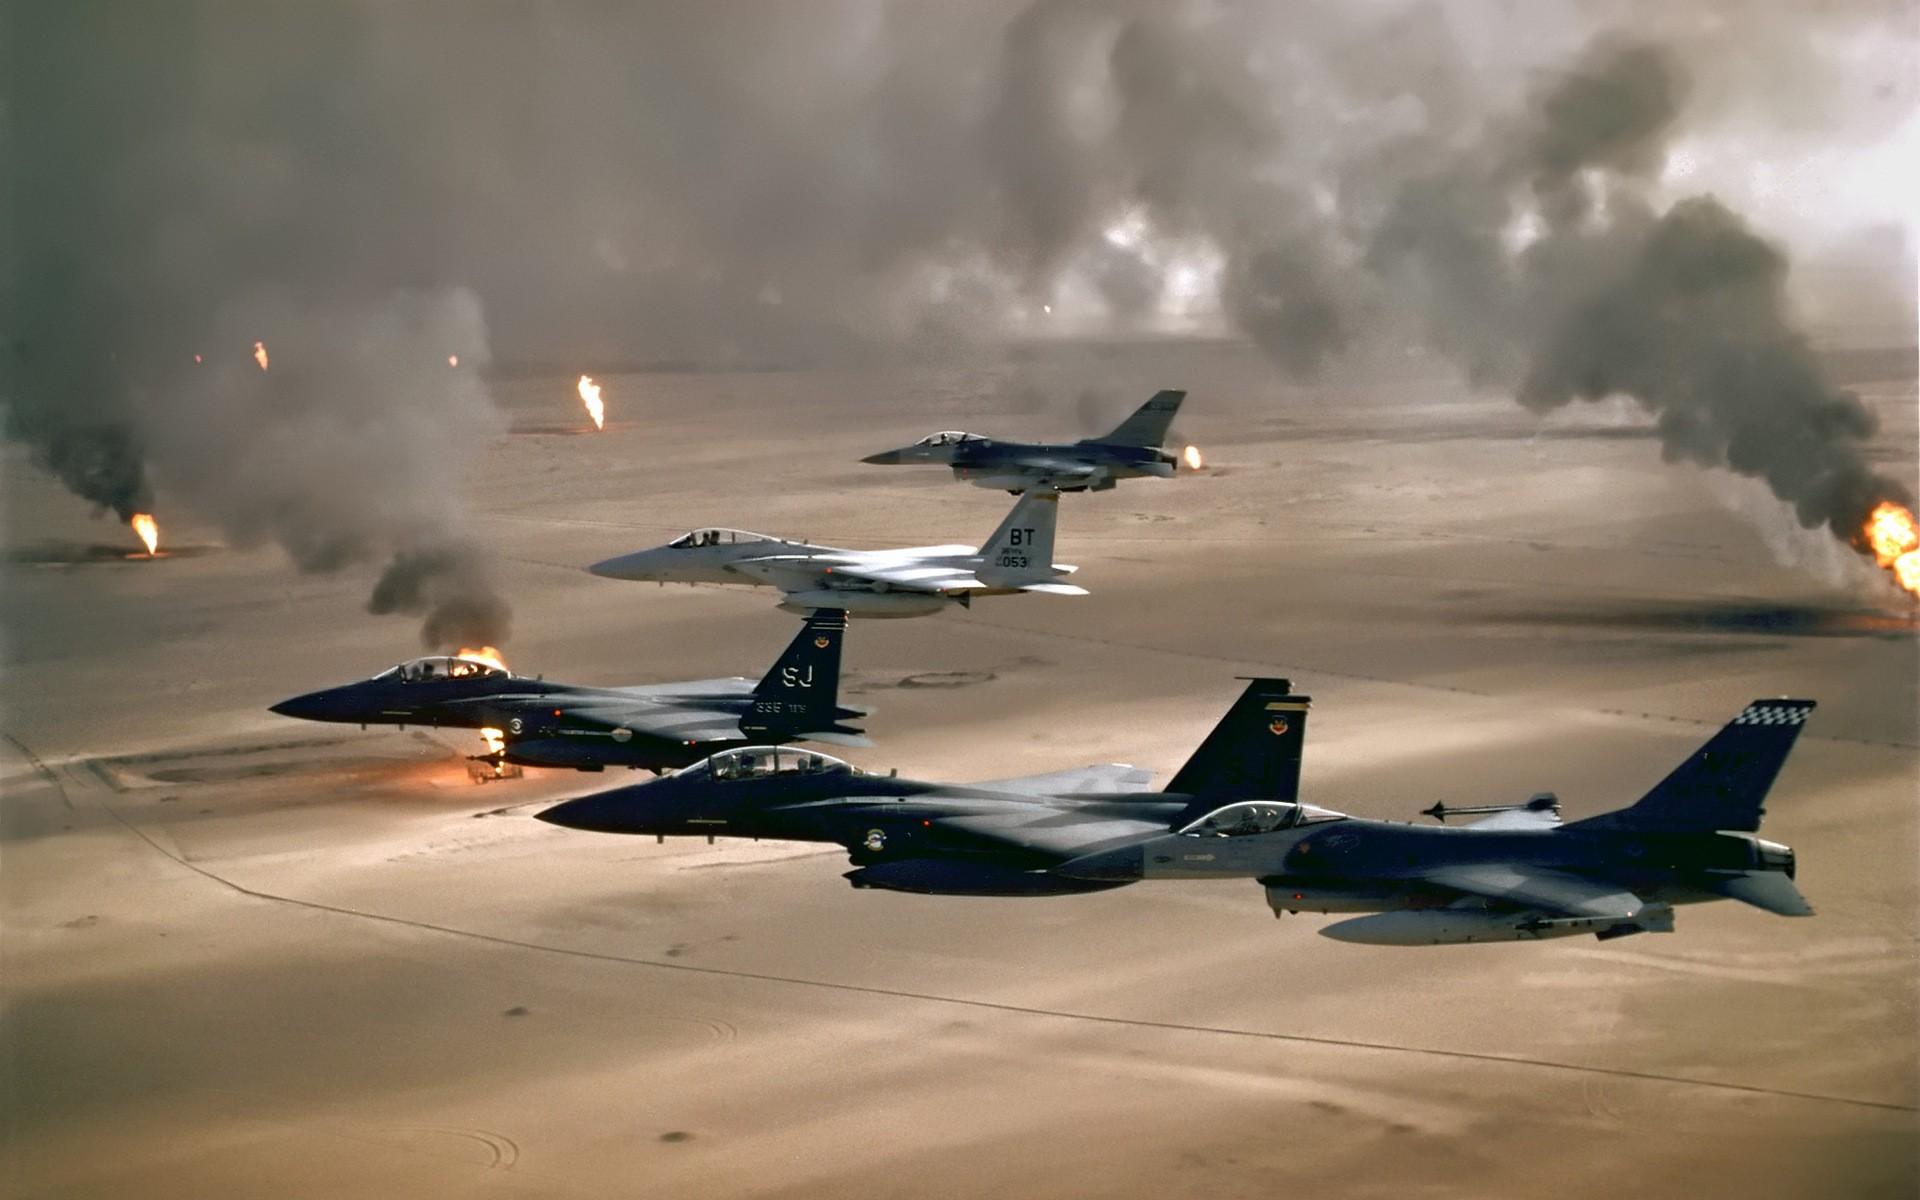 Wallpaper : vehicle, war, airplane, General Dynamics F 16 Fighting